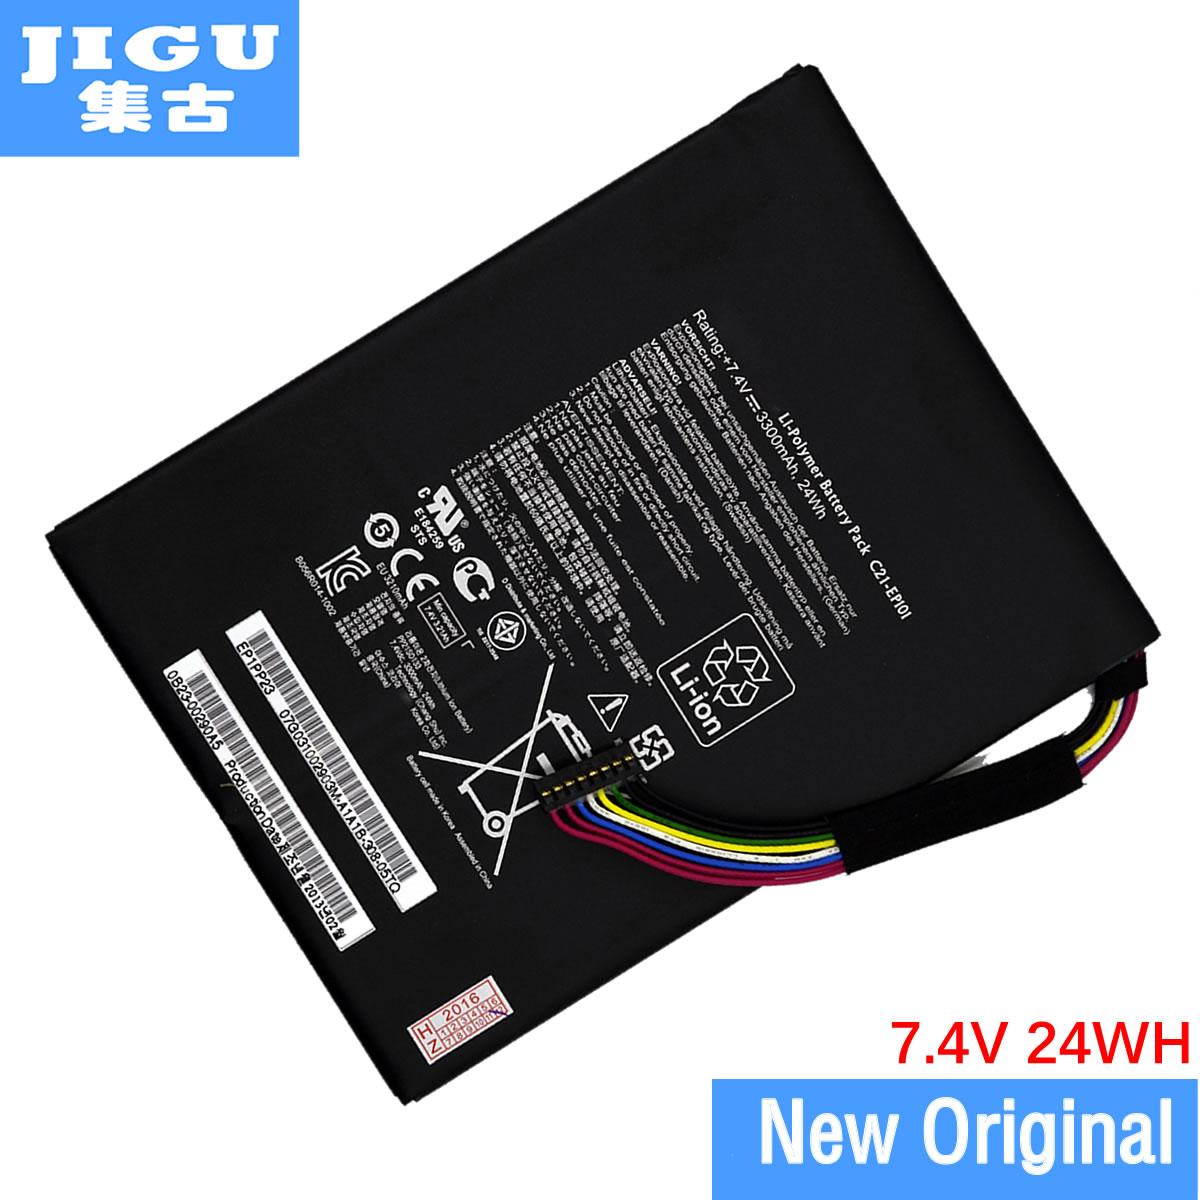 JIGU C21-EP101 Original Laptop Battery For Asus TF101-B1 X11B001A 1B002A  1B004A 1B006A 1B011A 1B012A 1B017 1B023A